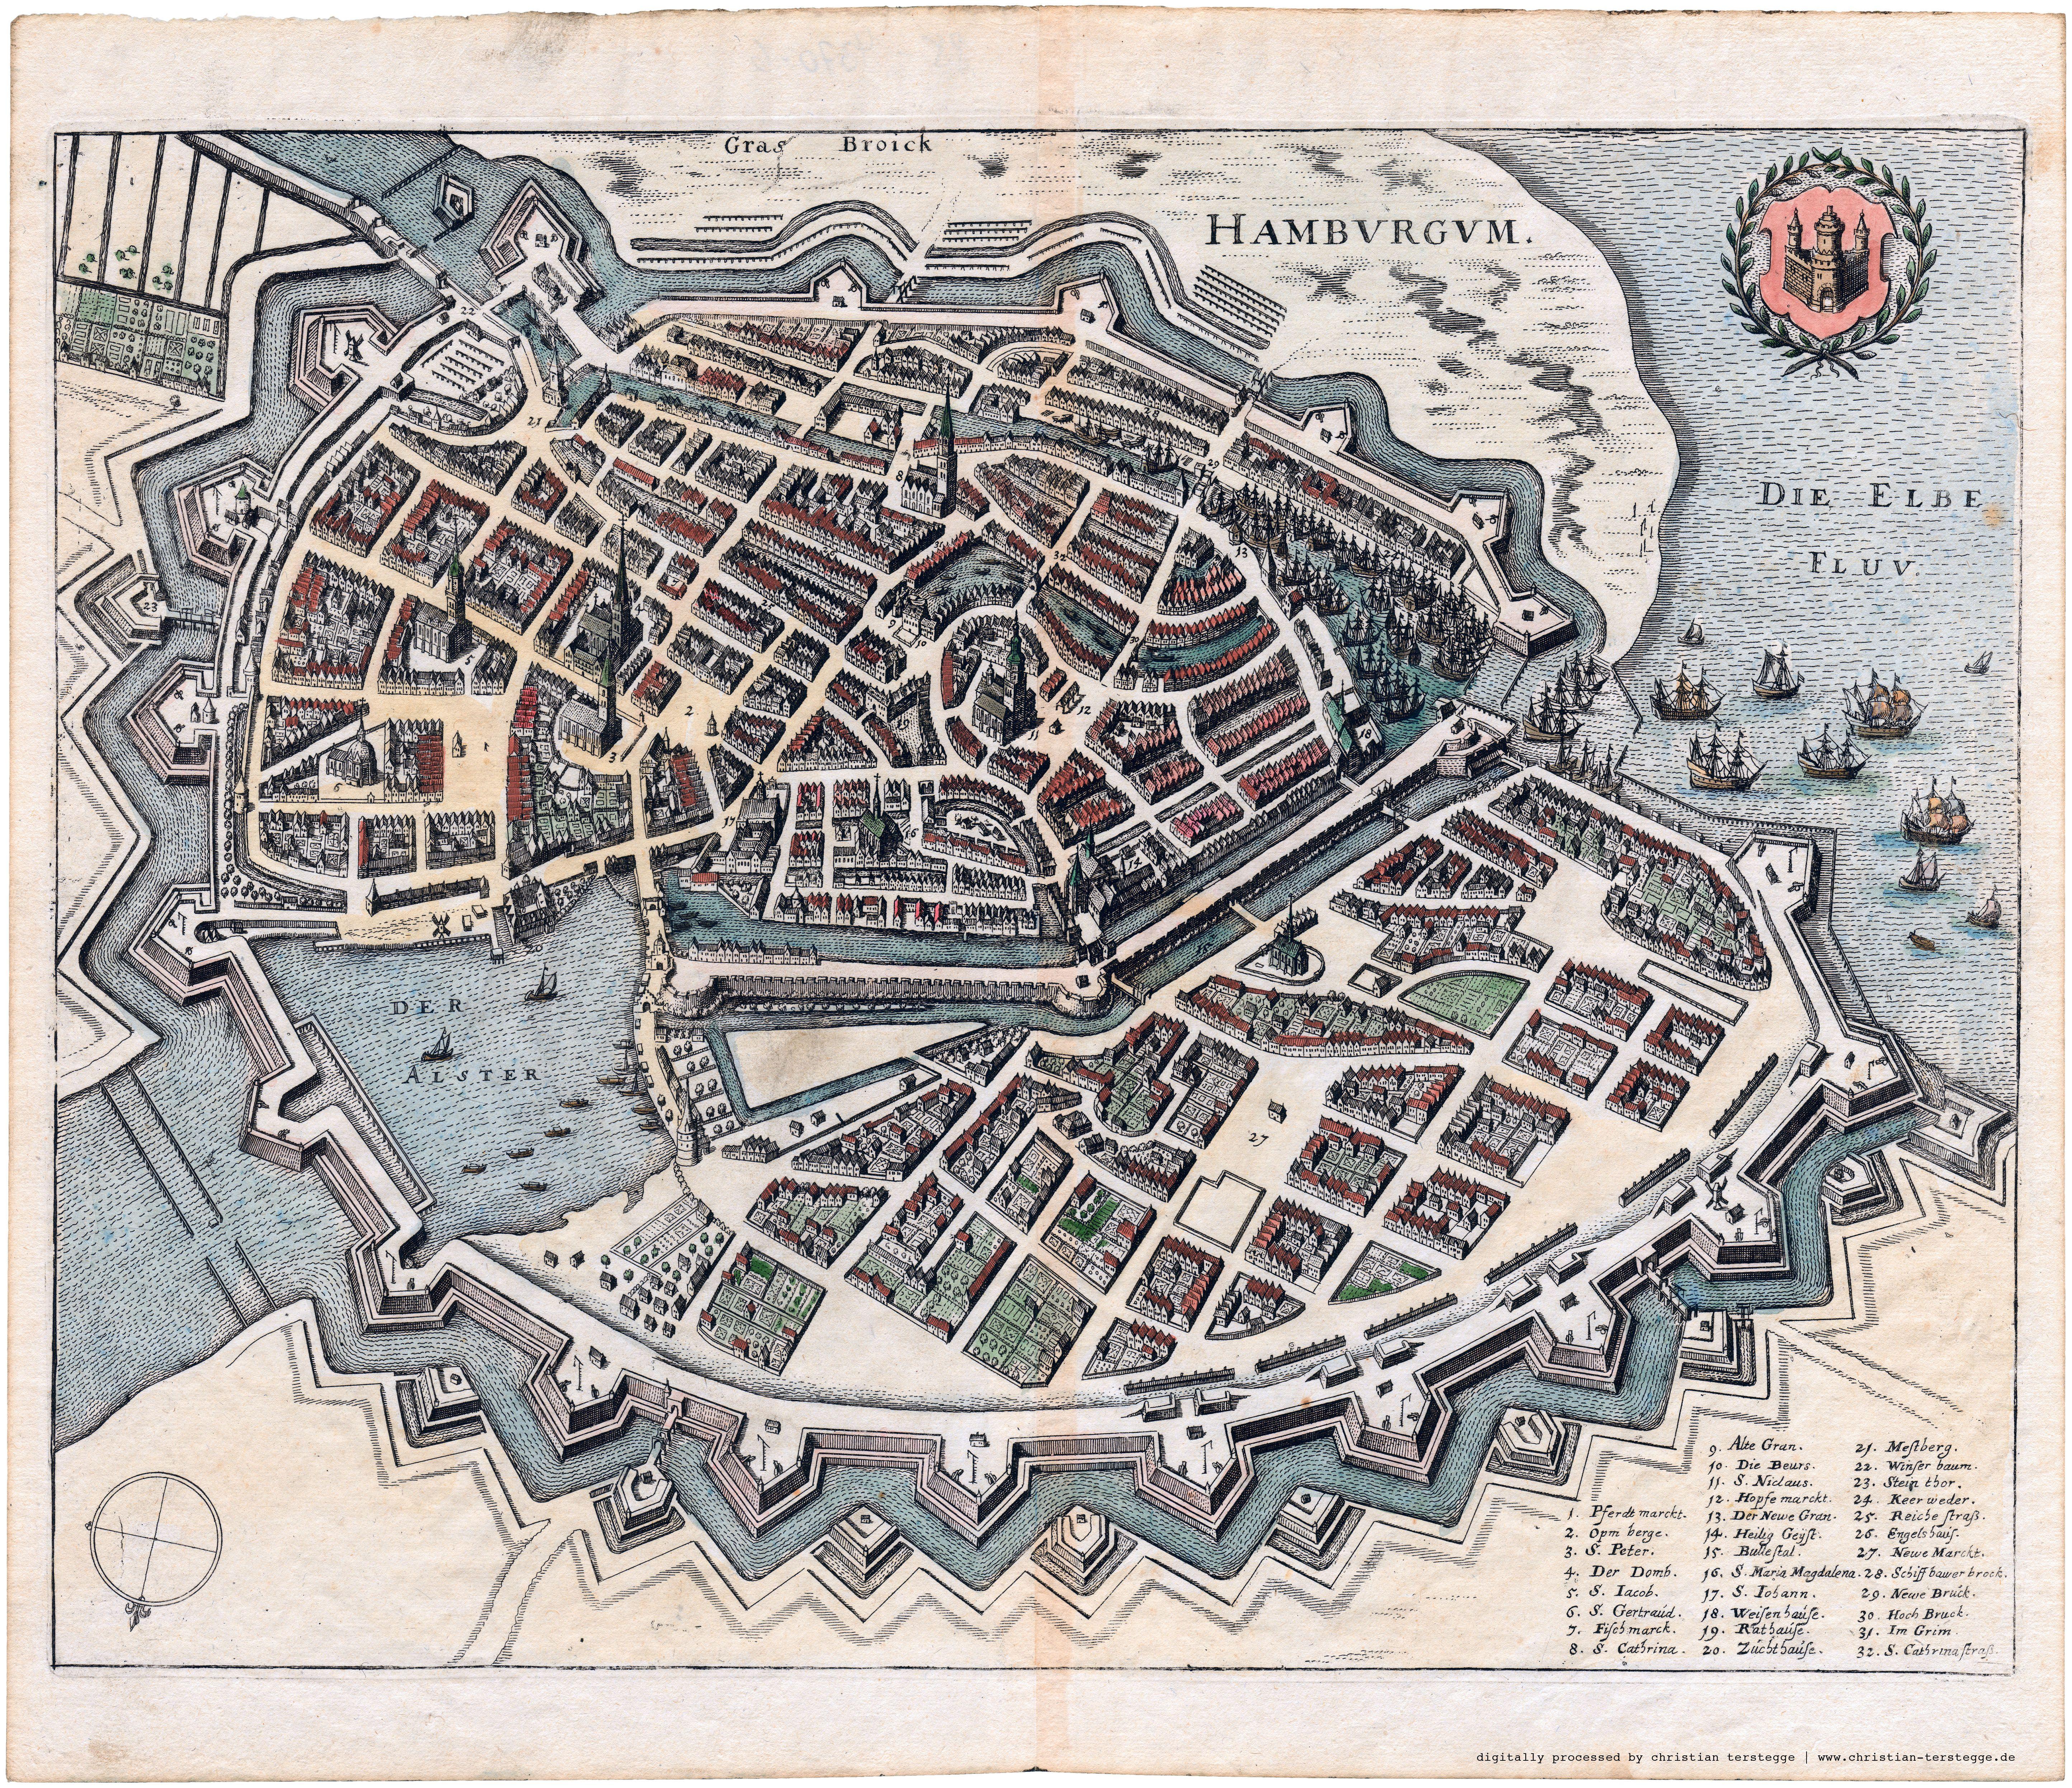 Karte Hamburg 1641 Matthaus Merian Hamburg Illustrierte Karten